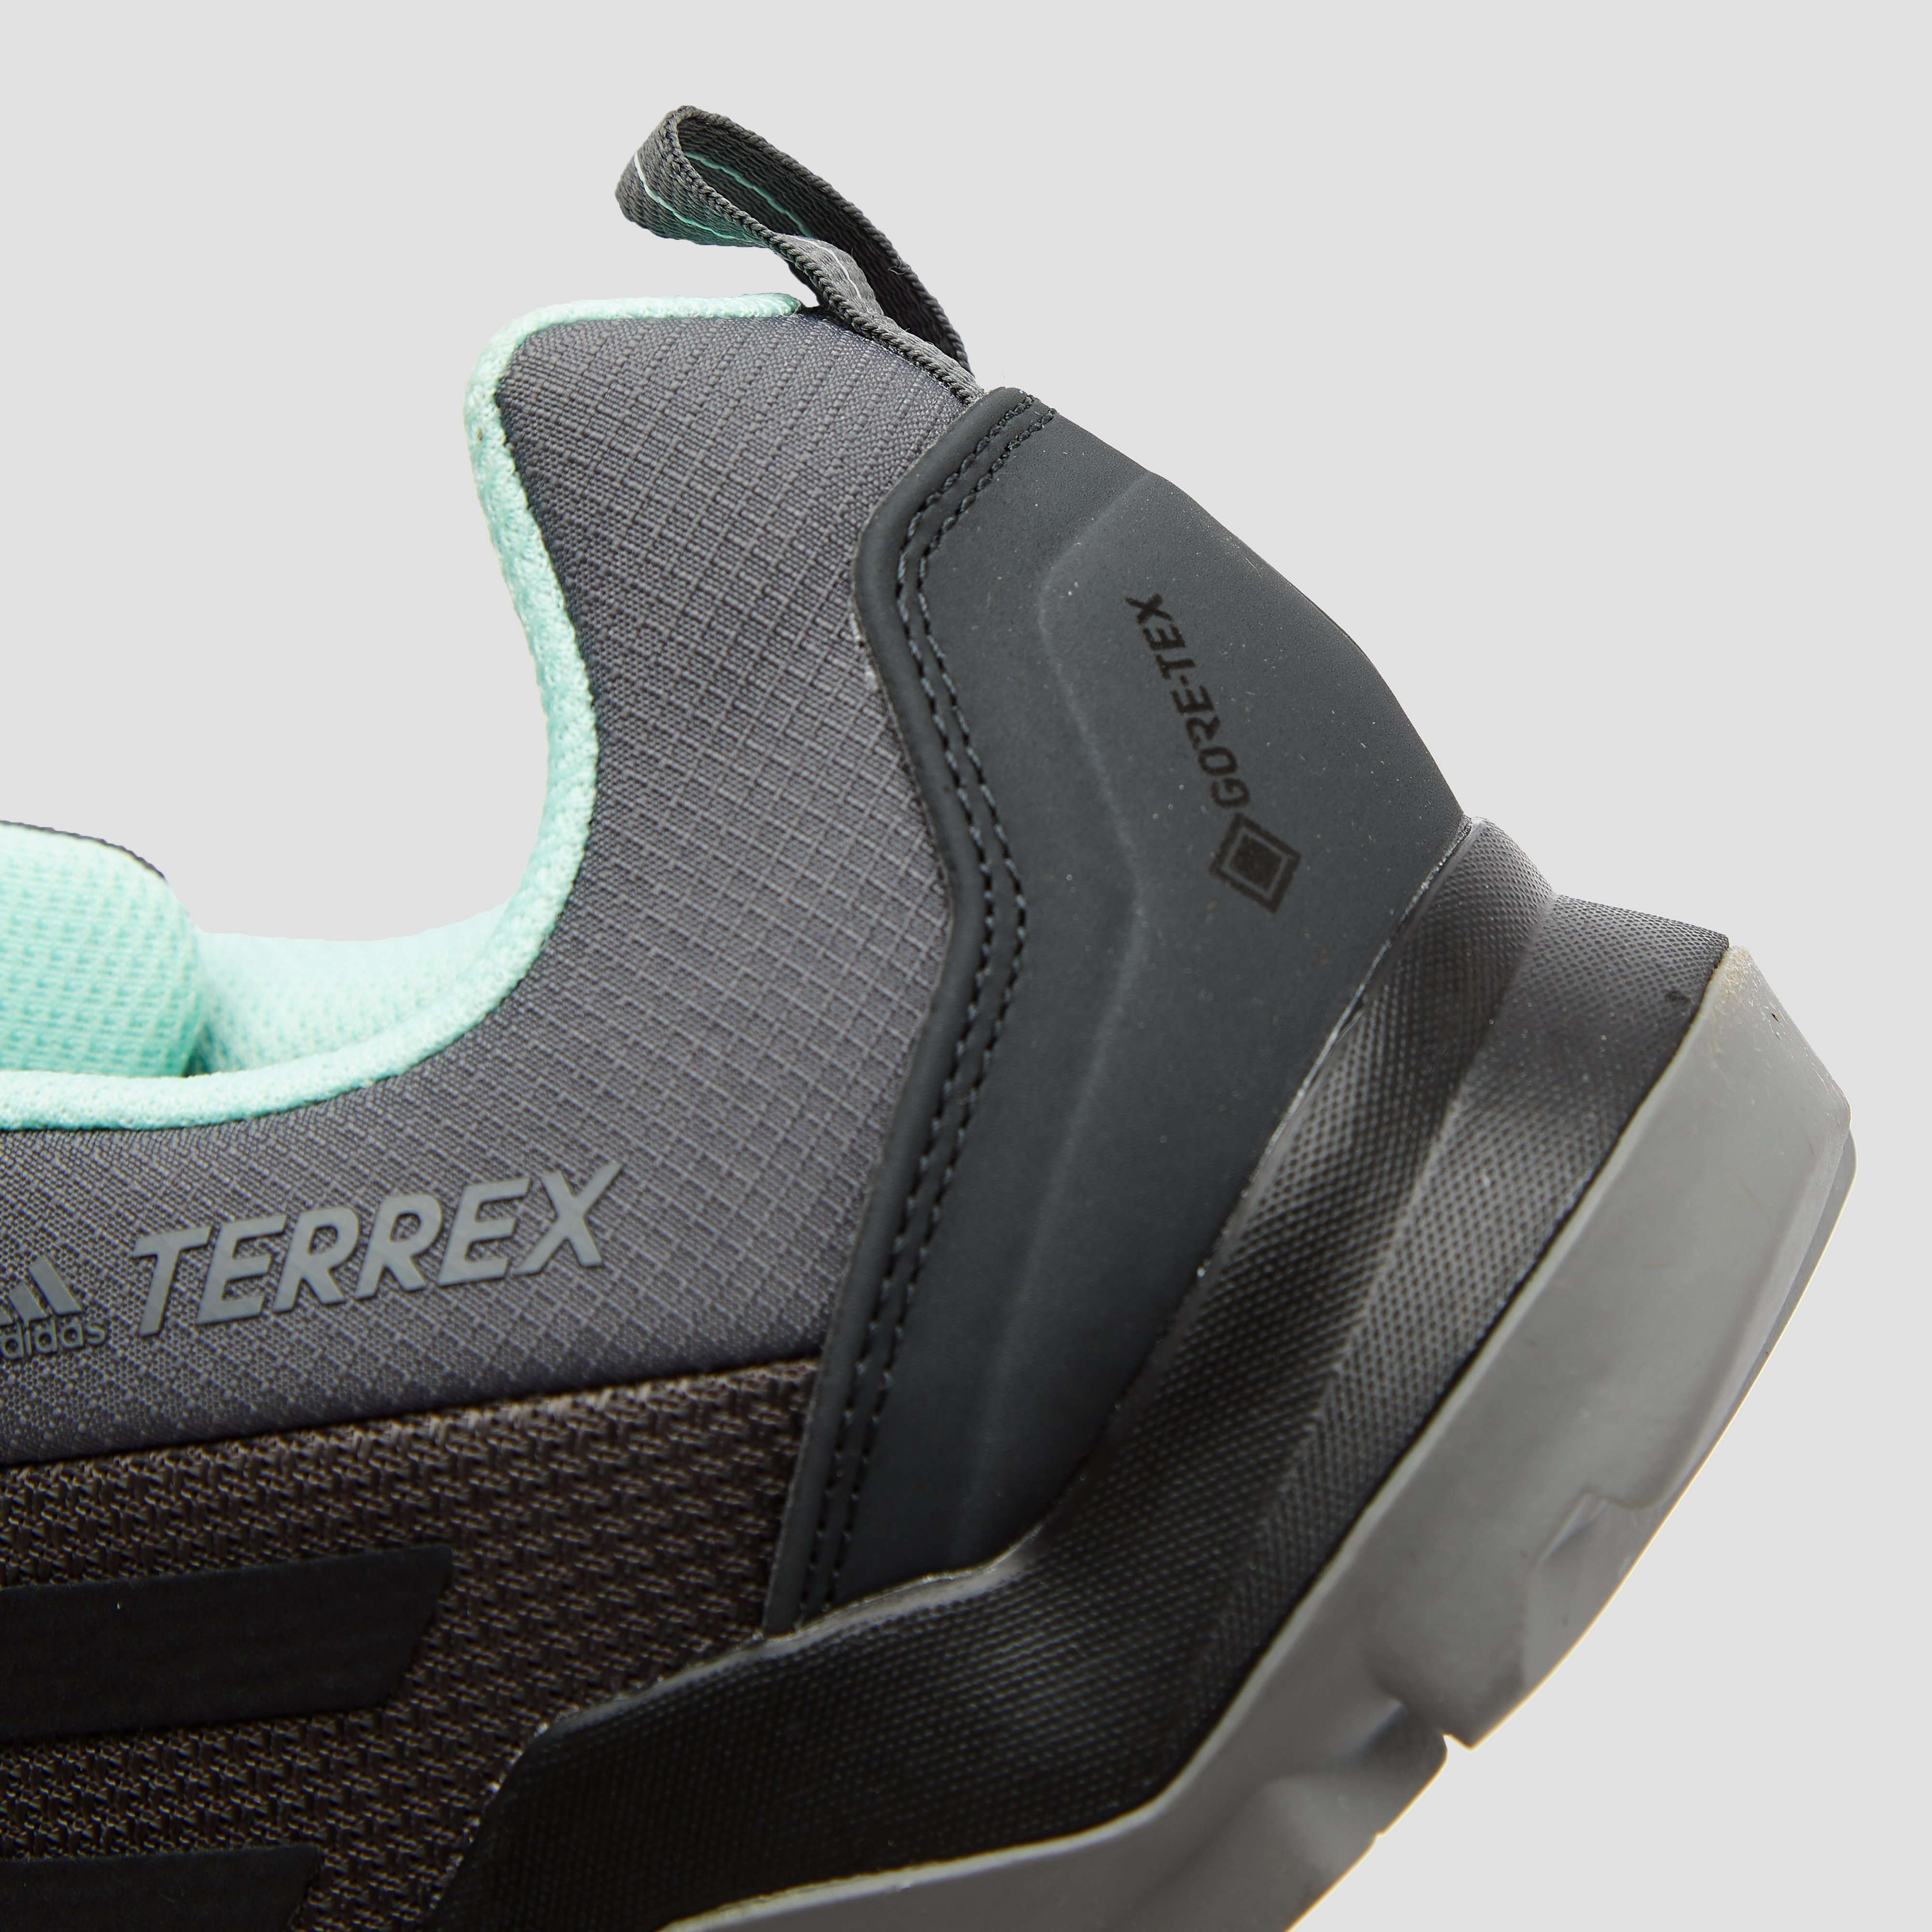 ADIDAS TERREX AX3 GTX WANDELSCHOENEN GRIJS/GROEN DAMES